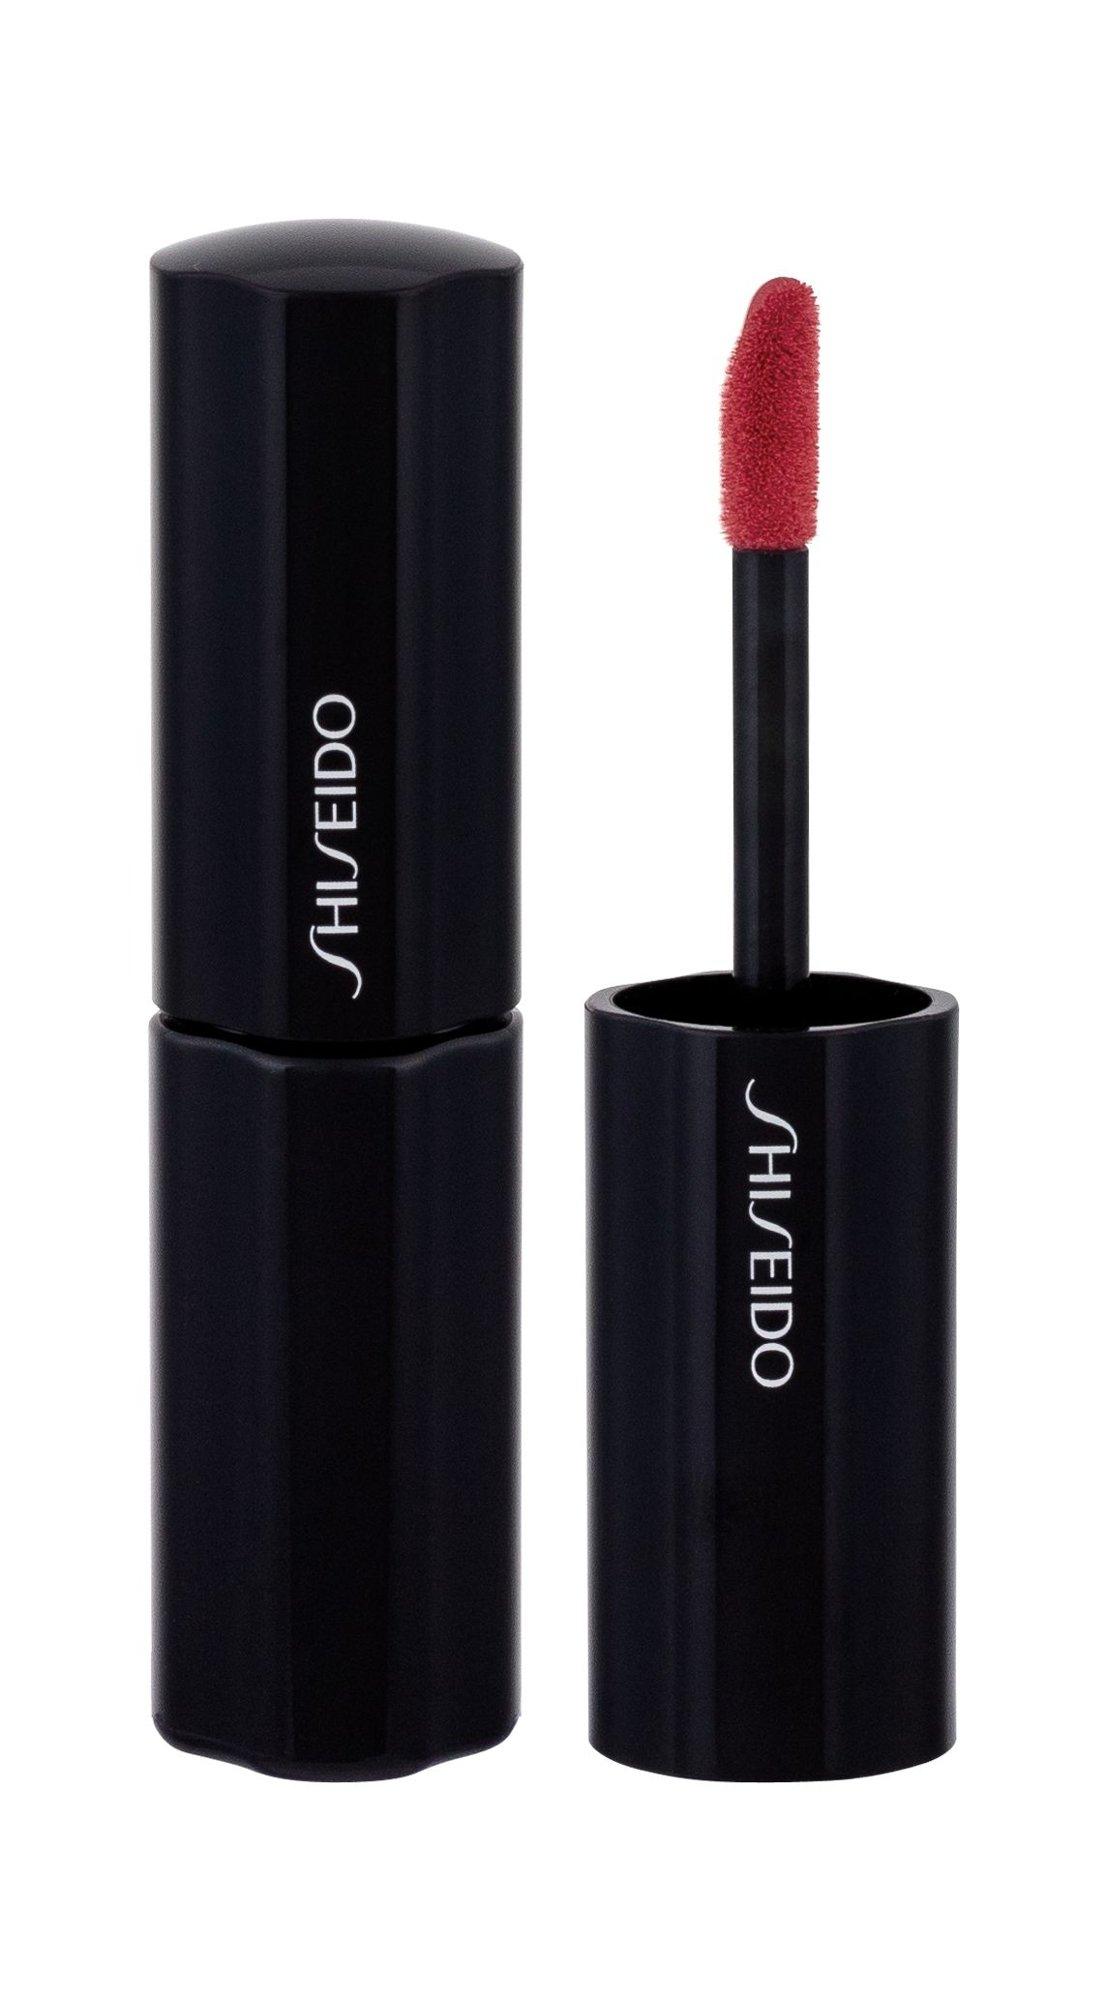 Shiseido Lacquer Rouge Lipstick 6ml RD319